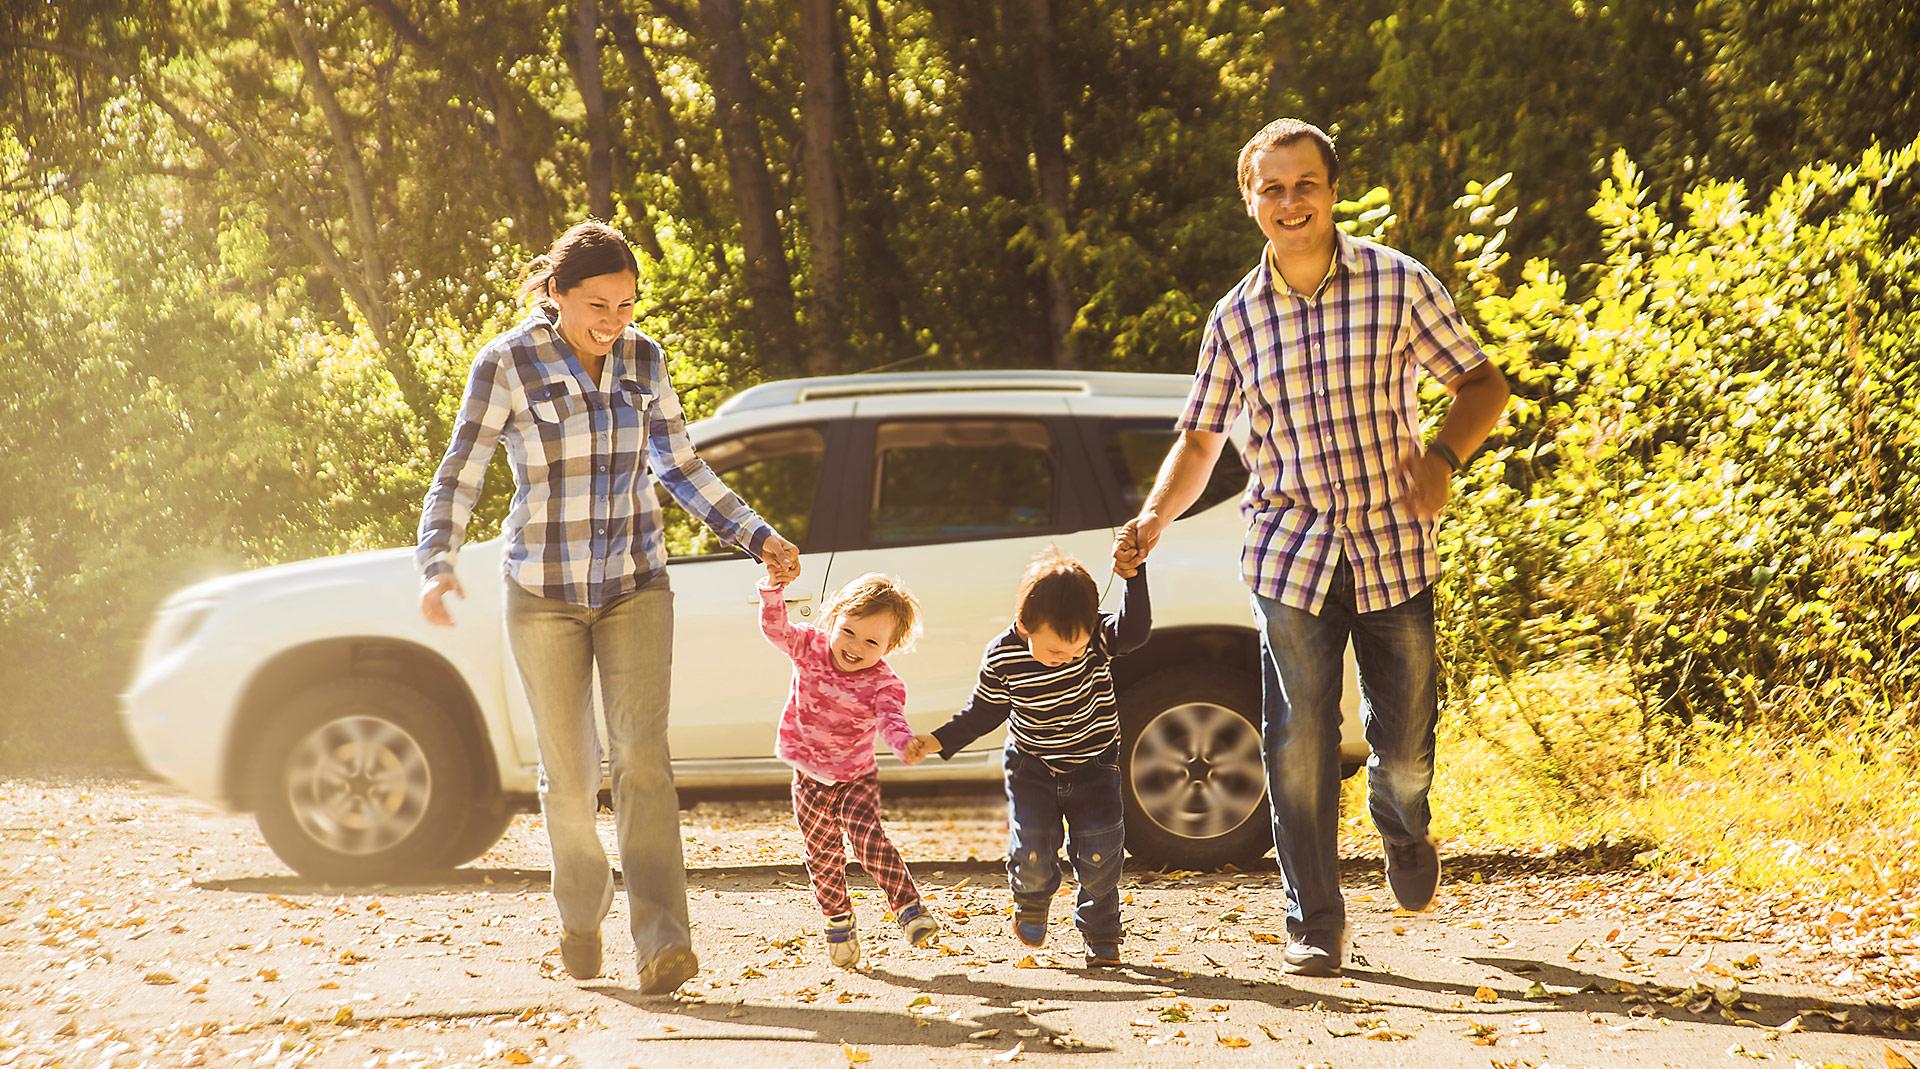 Deals on Wheels | Used BHPH Cars Missoula | Bad Credit Auto Loans ...